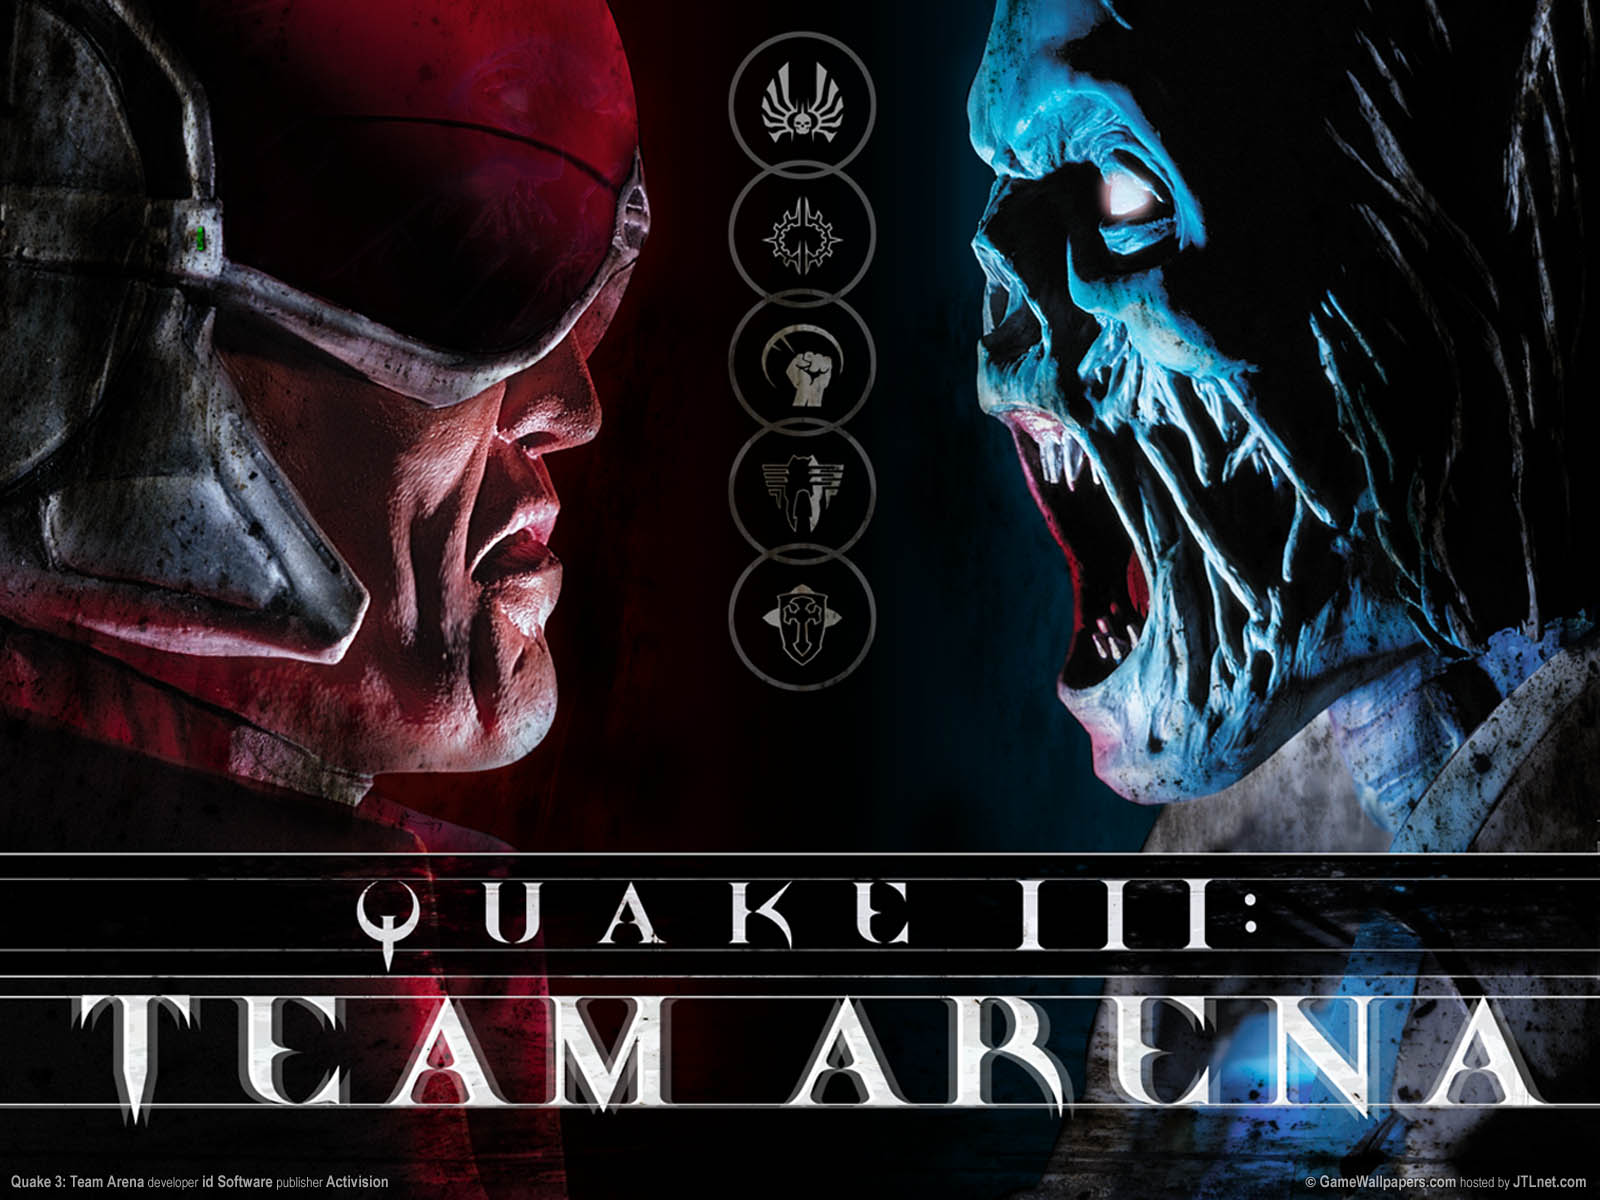 Quake 3: Team Arenaνmmer=01 achtergrond  1600x1200